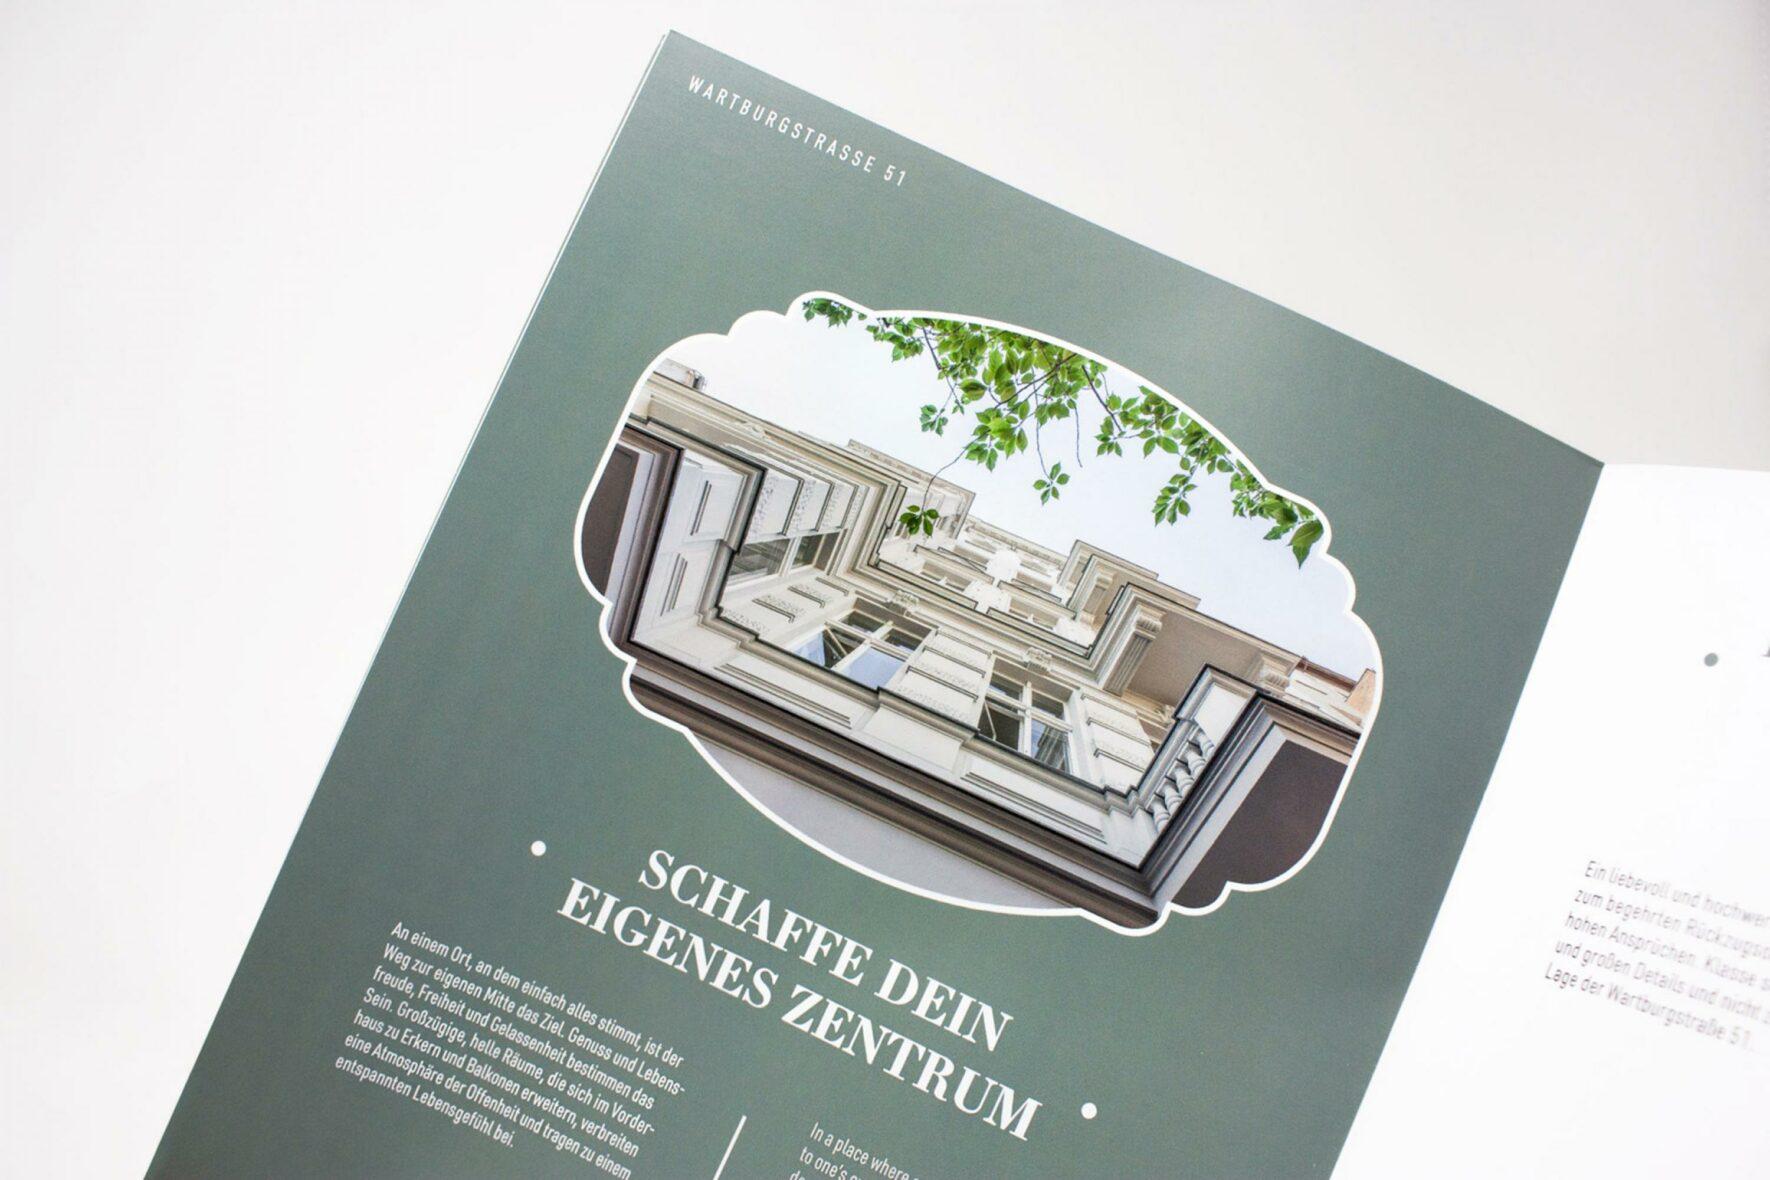 Immobilienbranding-wartburg-Trendcity-Broschüre-FORMLOS-berlin_MG_8290